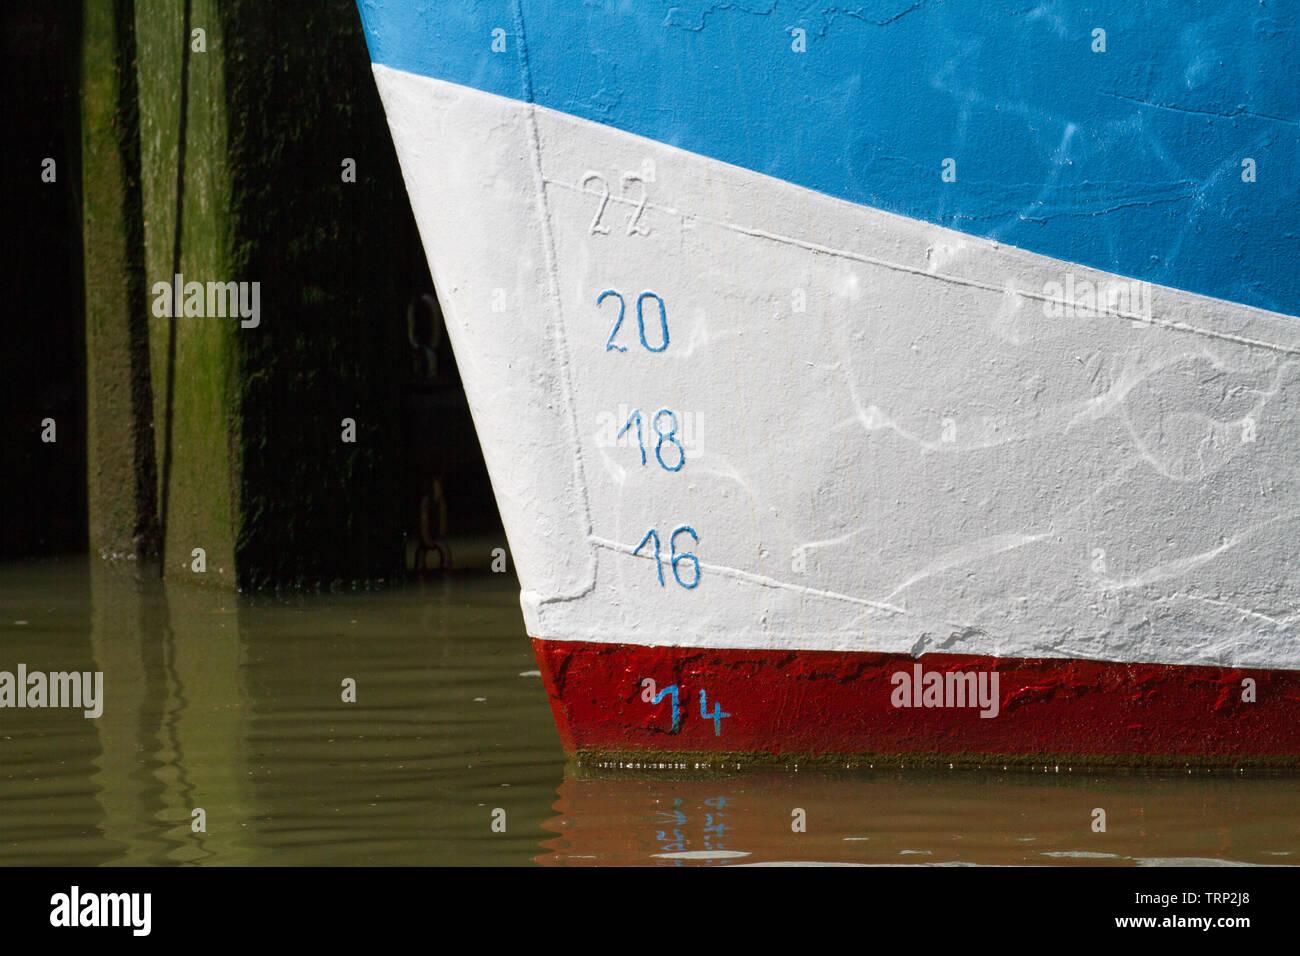 Loading markings on hull of fishing boat. Germany. - Stock Image